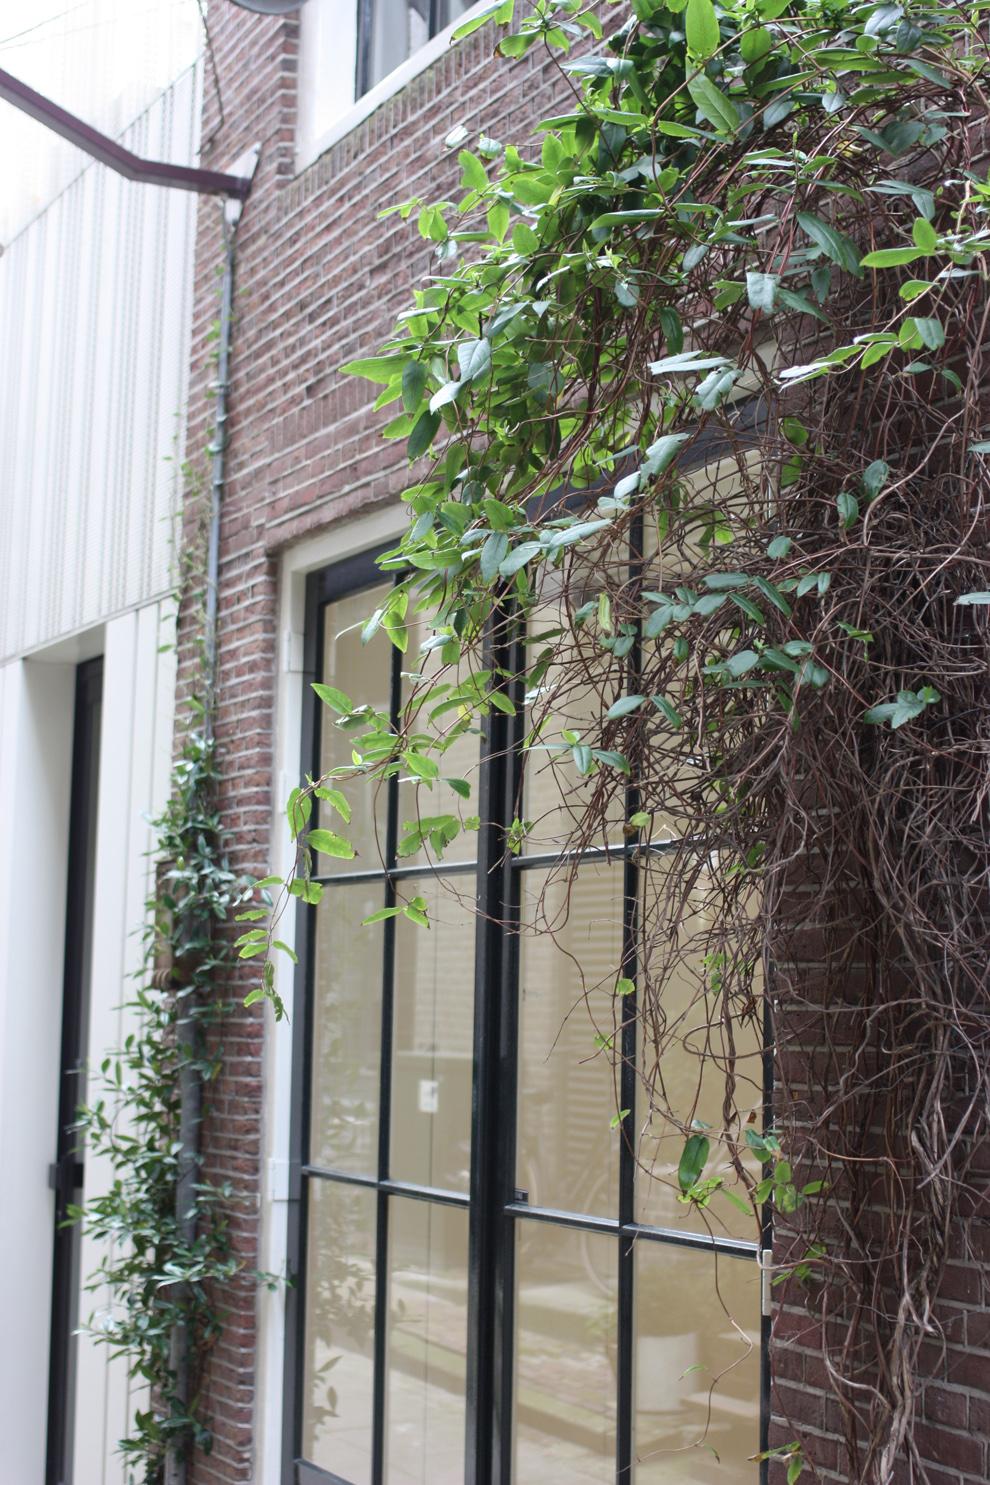 green_Amsterdam_window